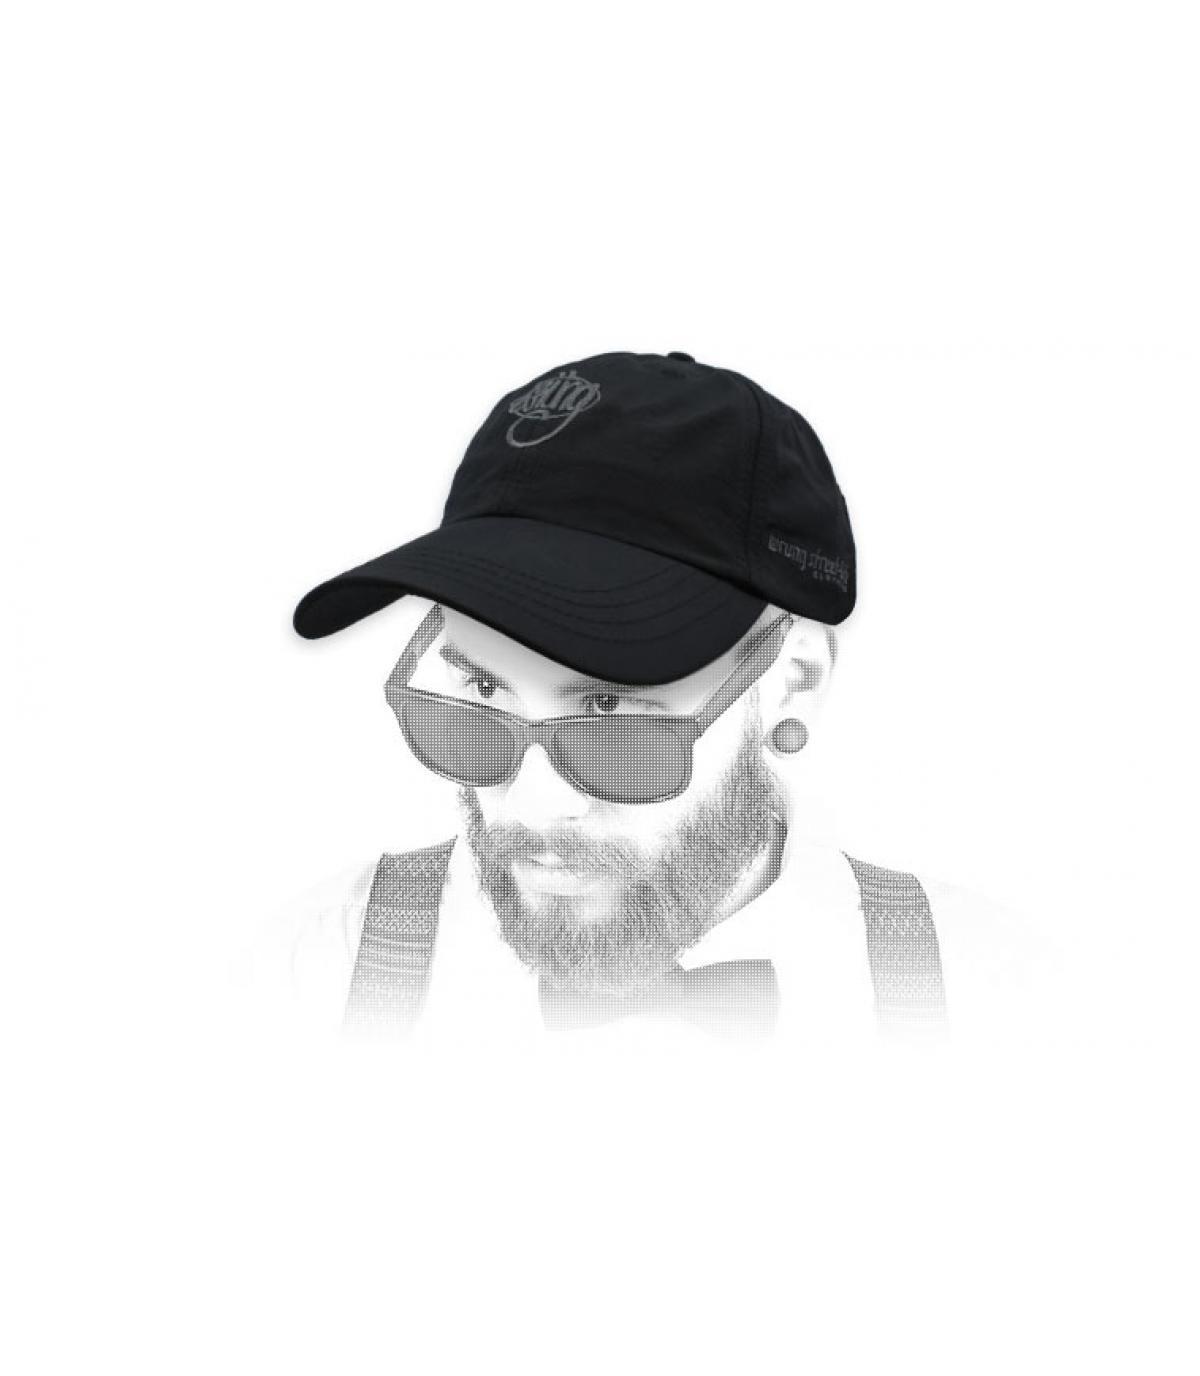 Wrung black cap '90s logo